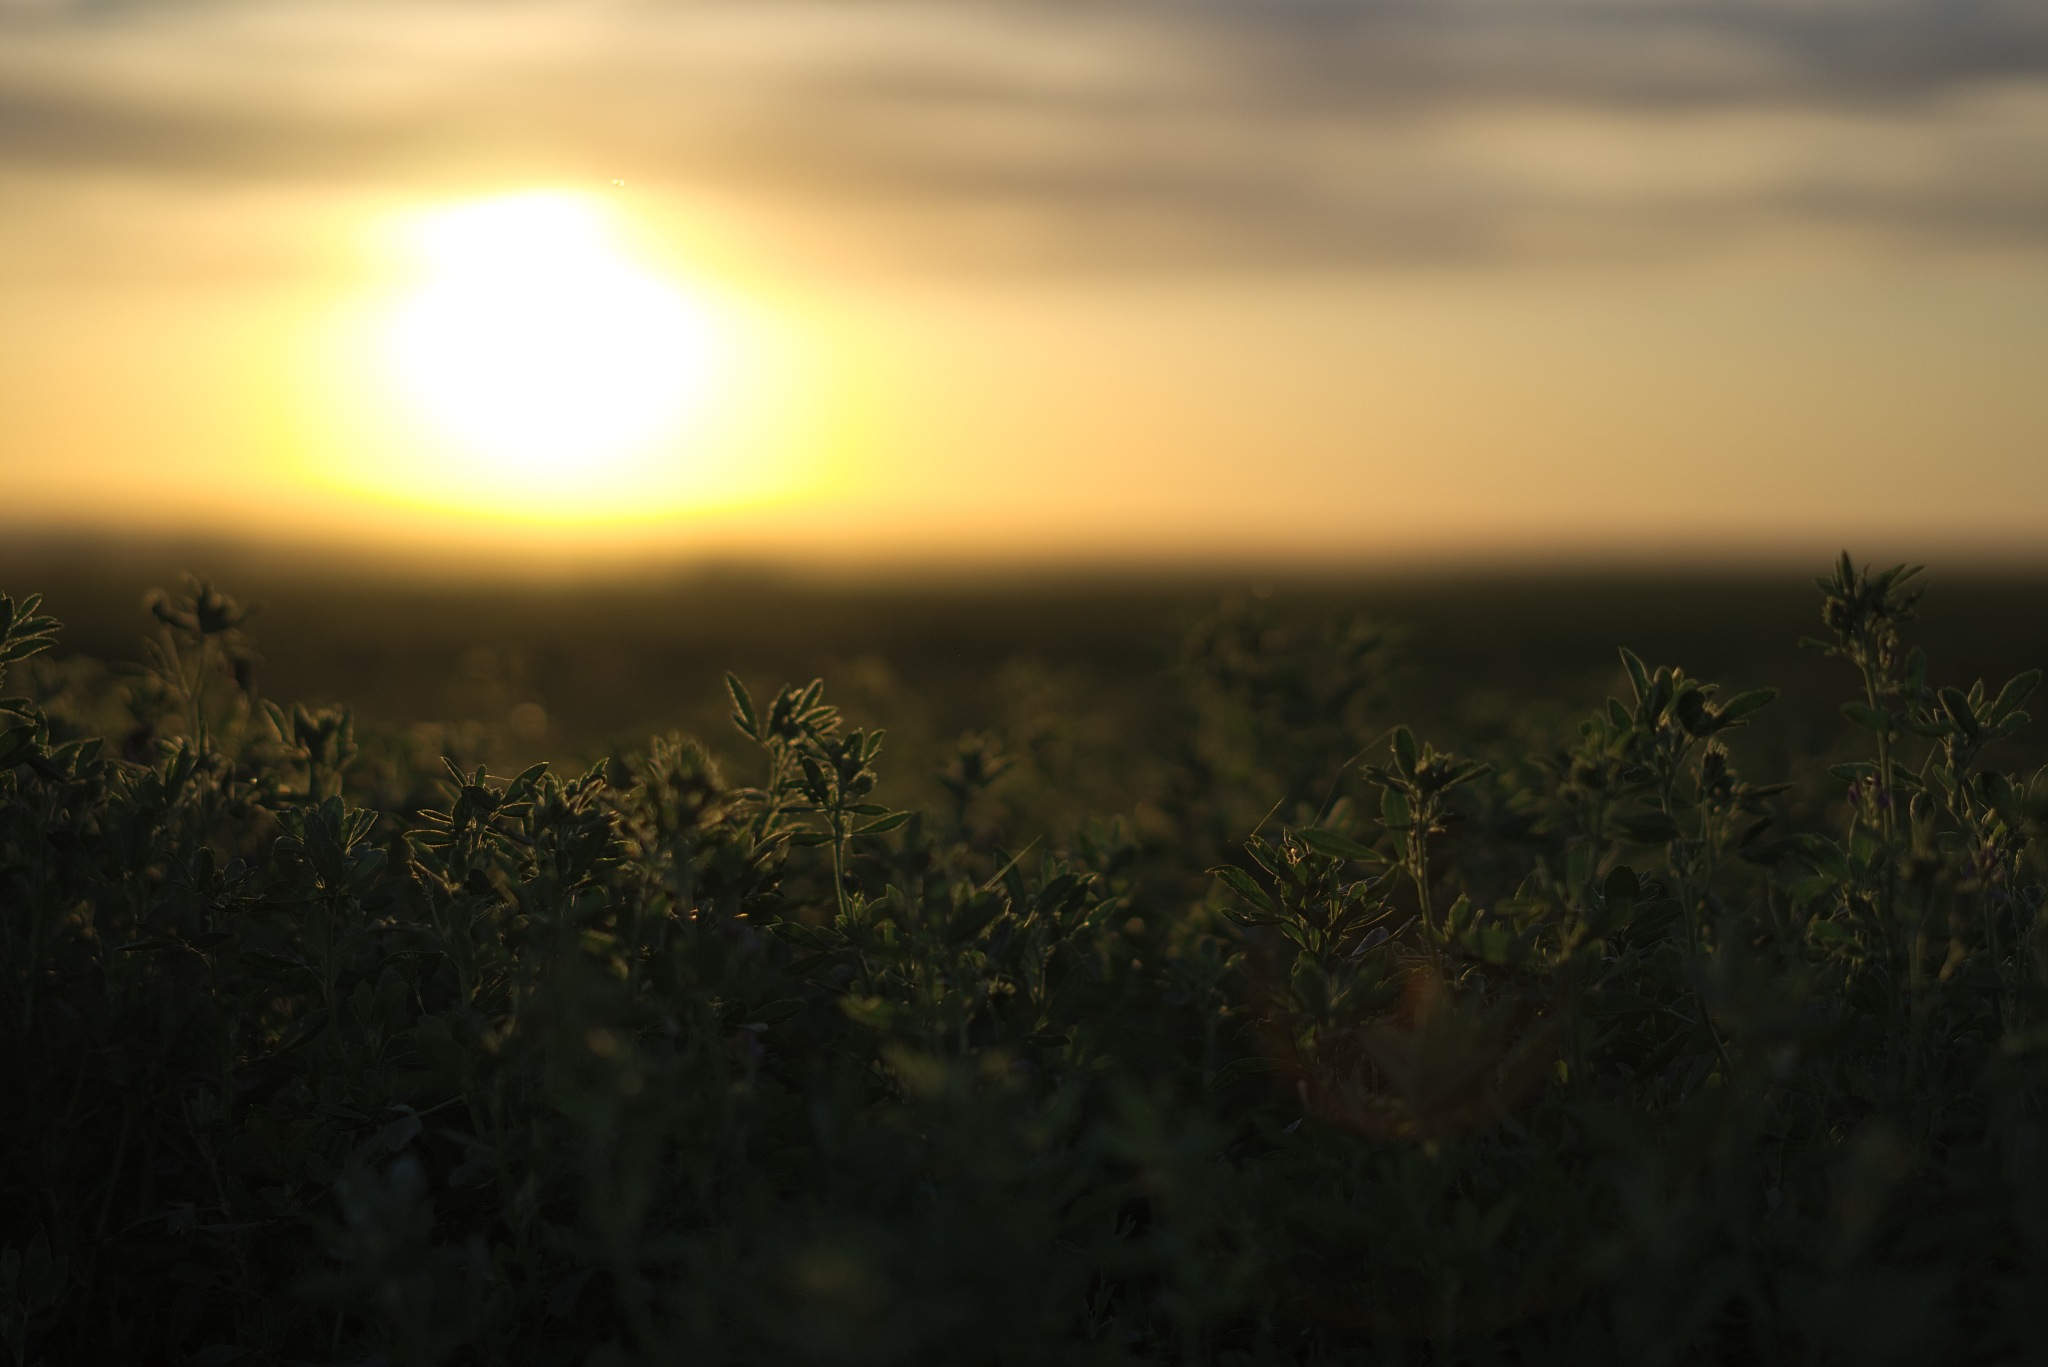 Evening Alfalfa by Bret Little